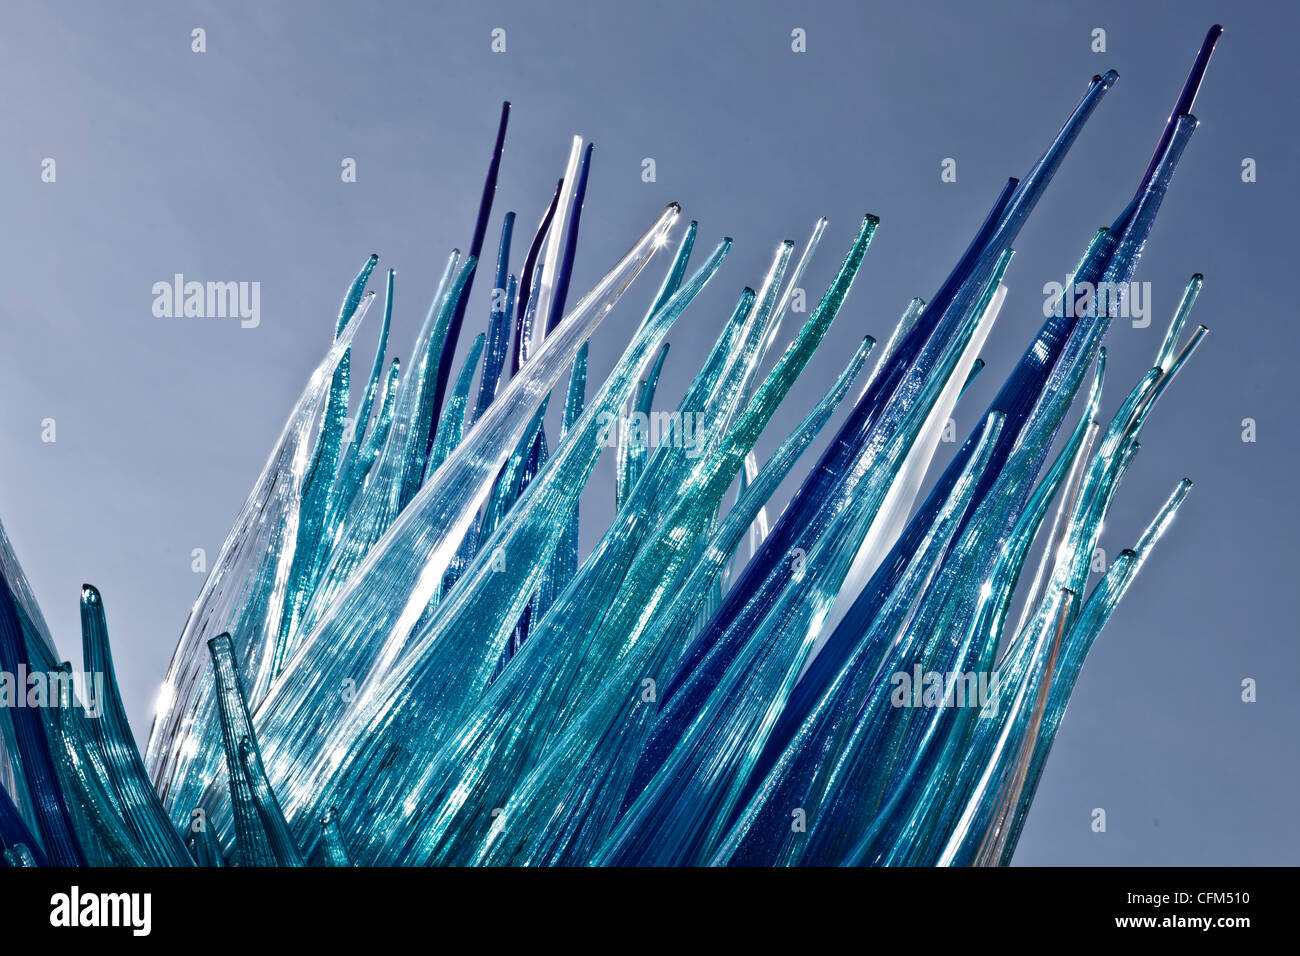 Murano glass sculpture - Stock Image